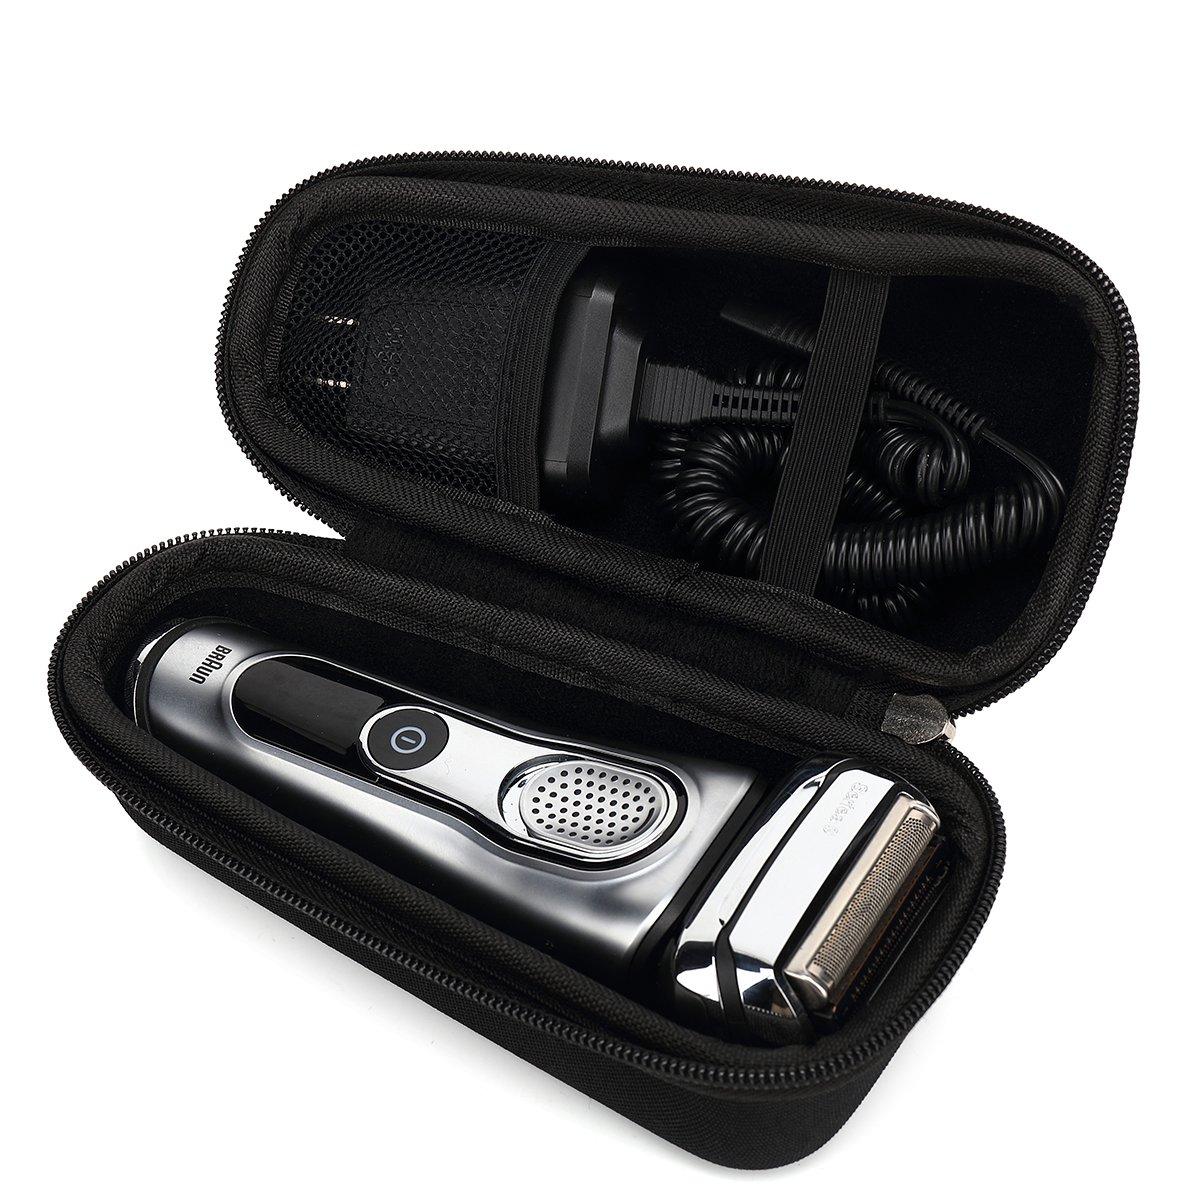 Hard Case for Braun Series 5 7 9 9290CC 790cc 9090cc Men Shavers Razor with mesh bag by Aproca